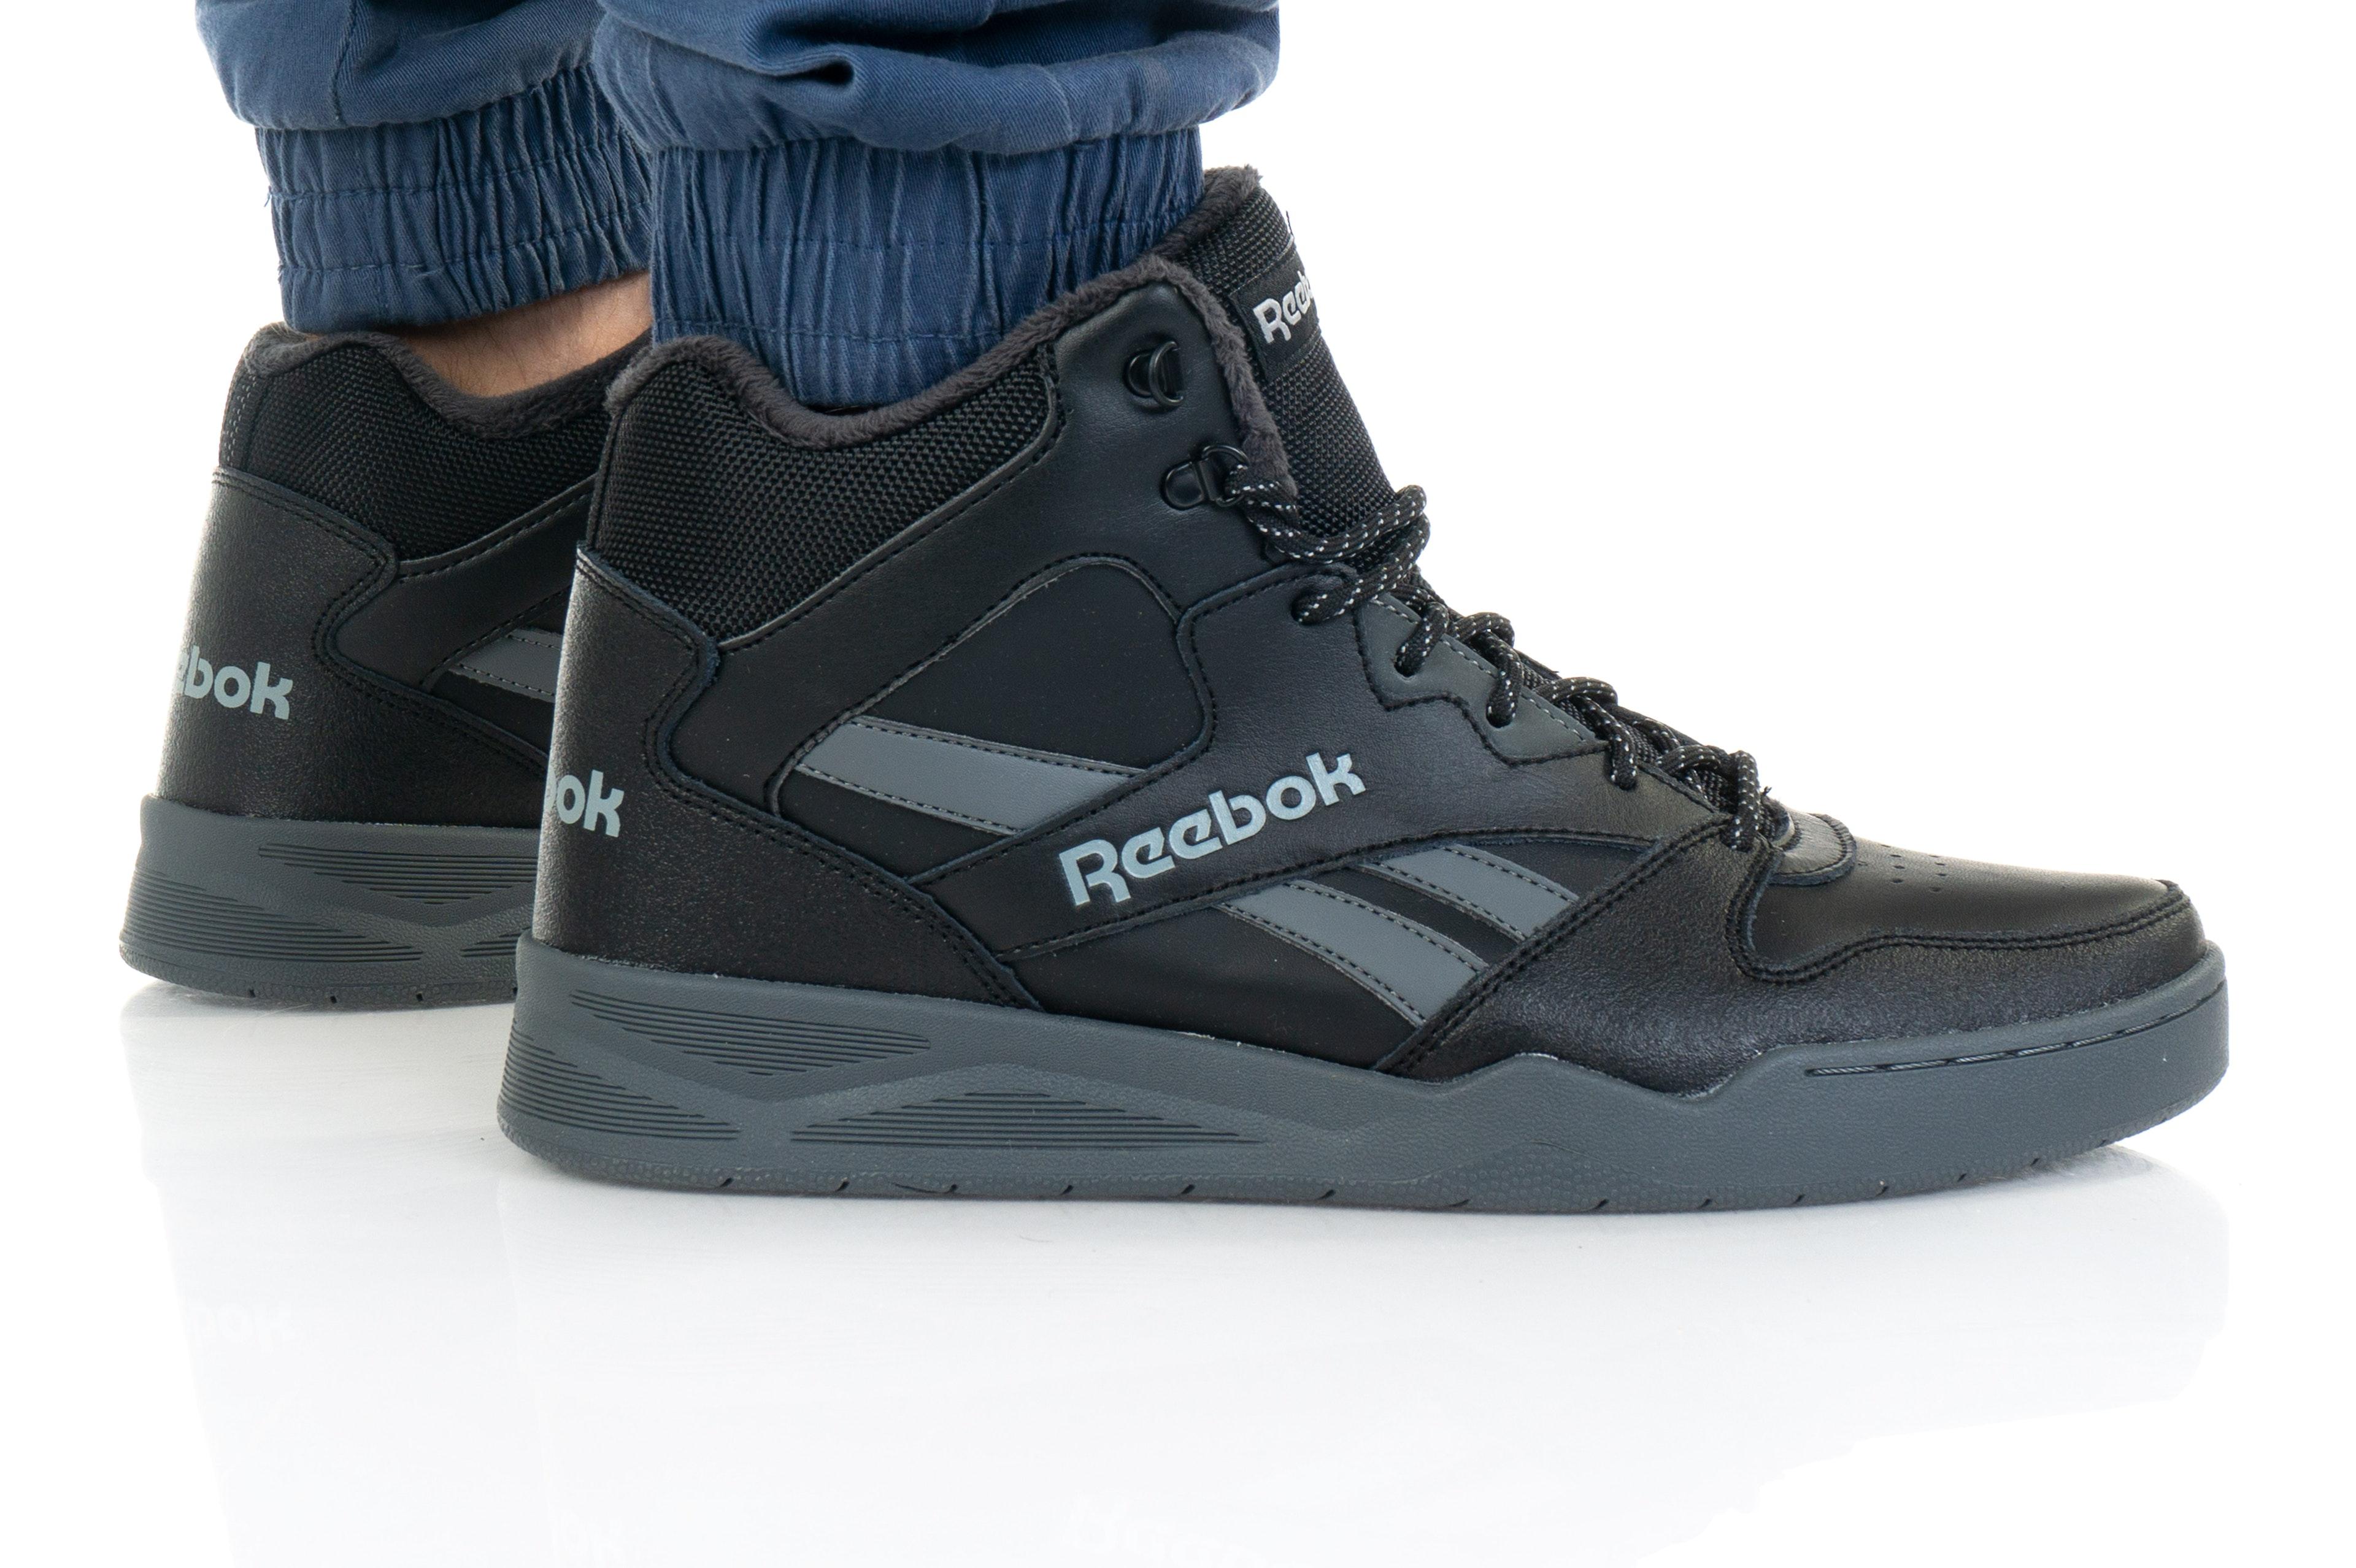 Reebok ROYAL BB4500 HI2 FW0878